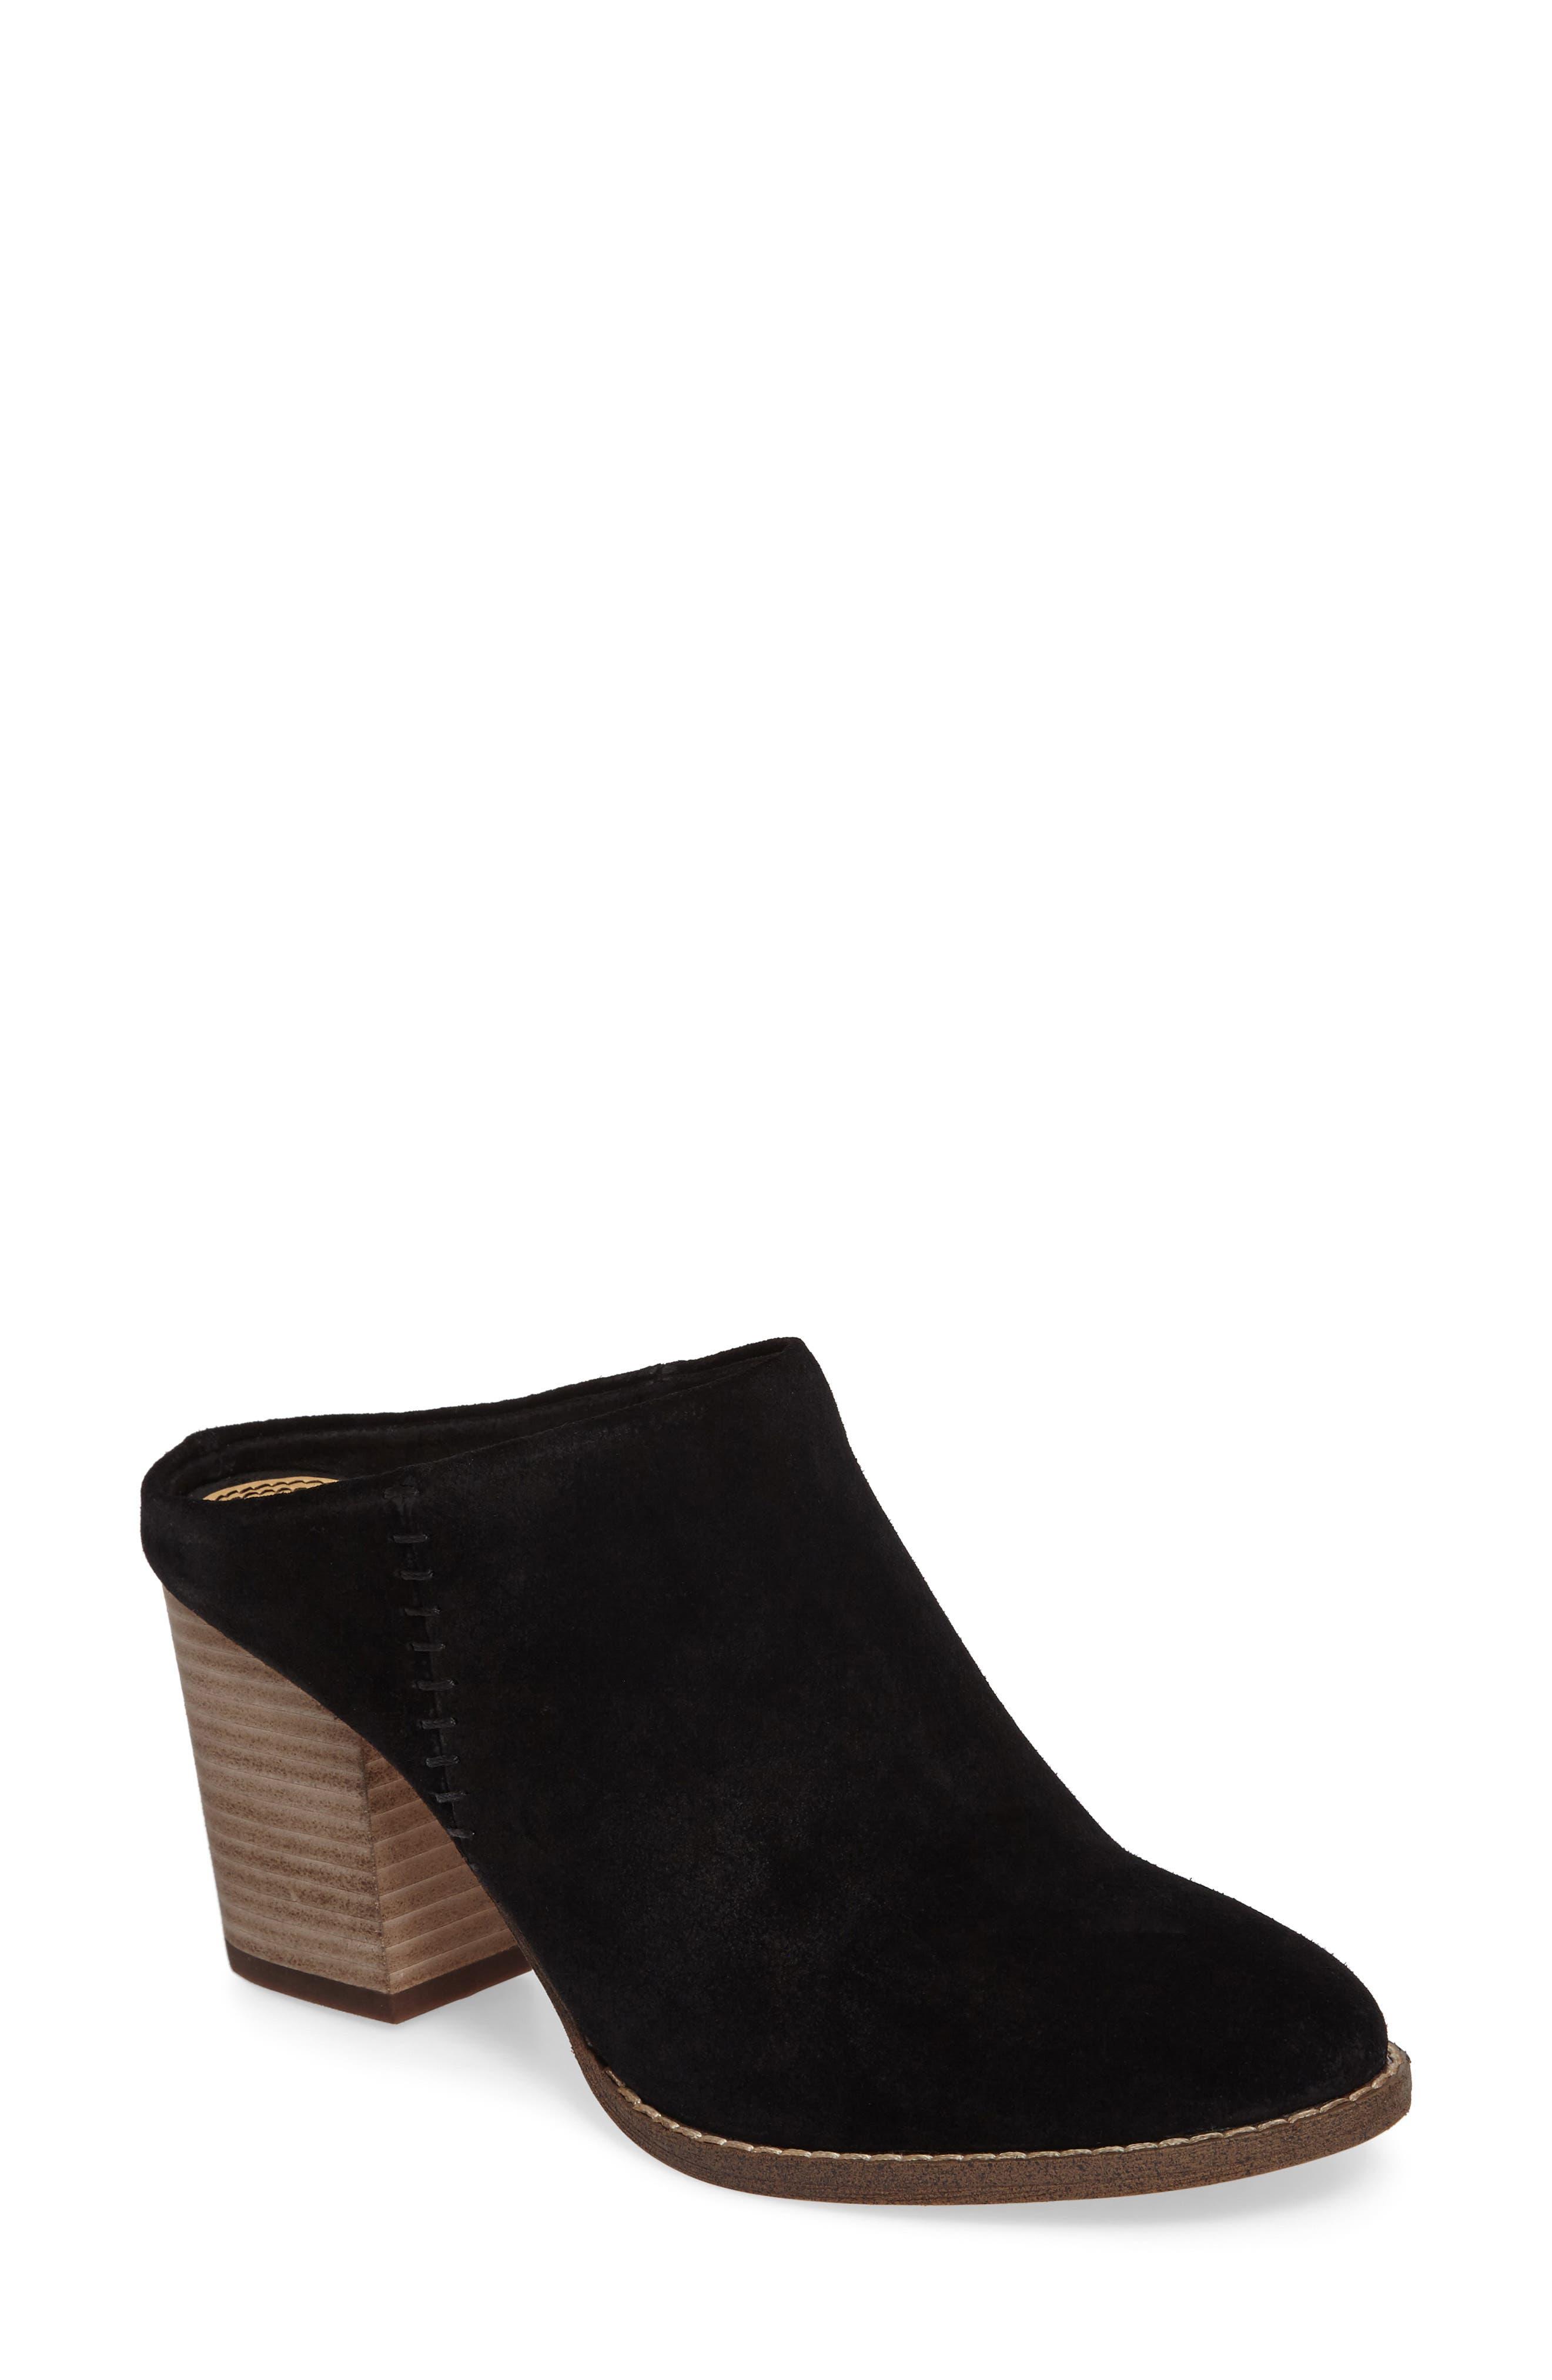 Main Image - Splendid Debrah Block Heel Mule (Women)